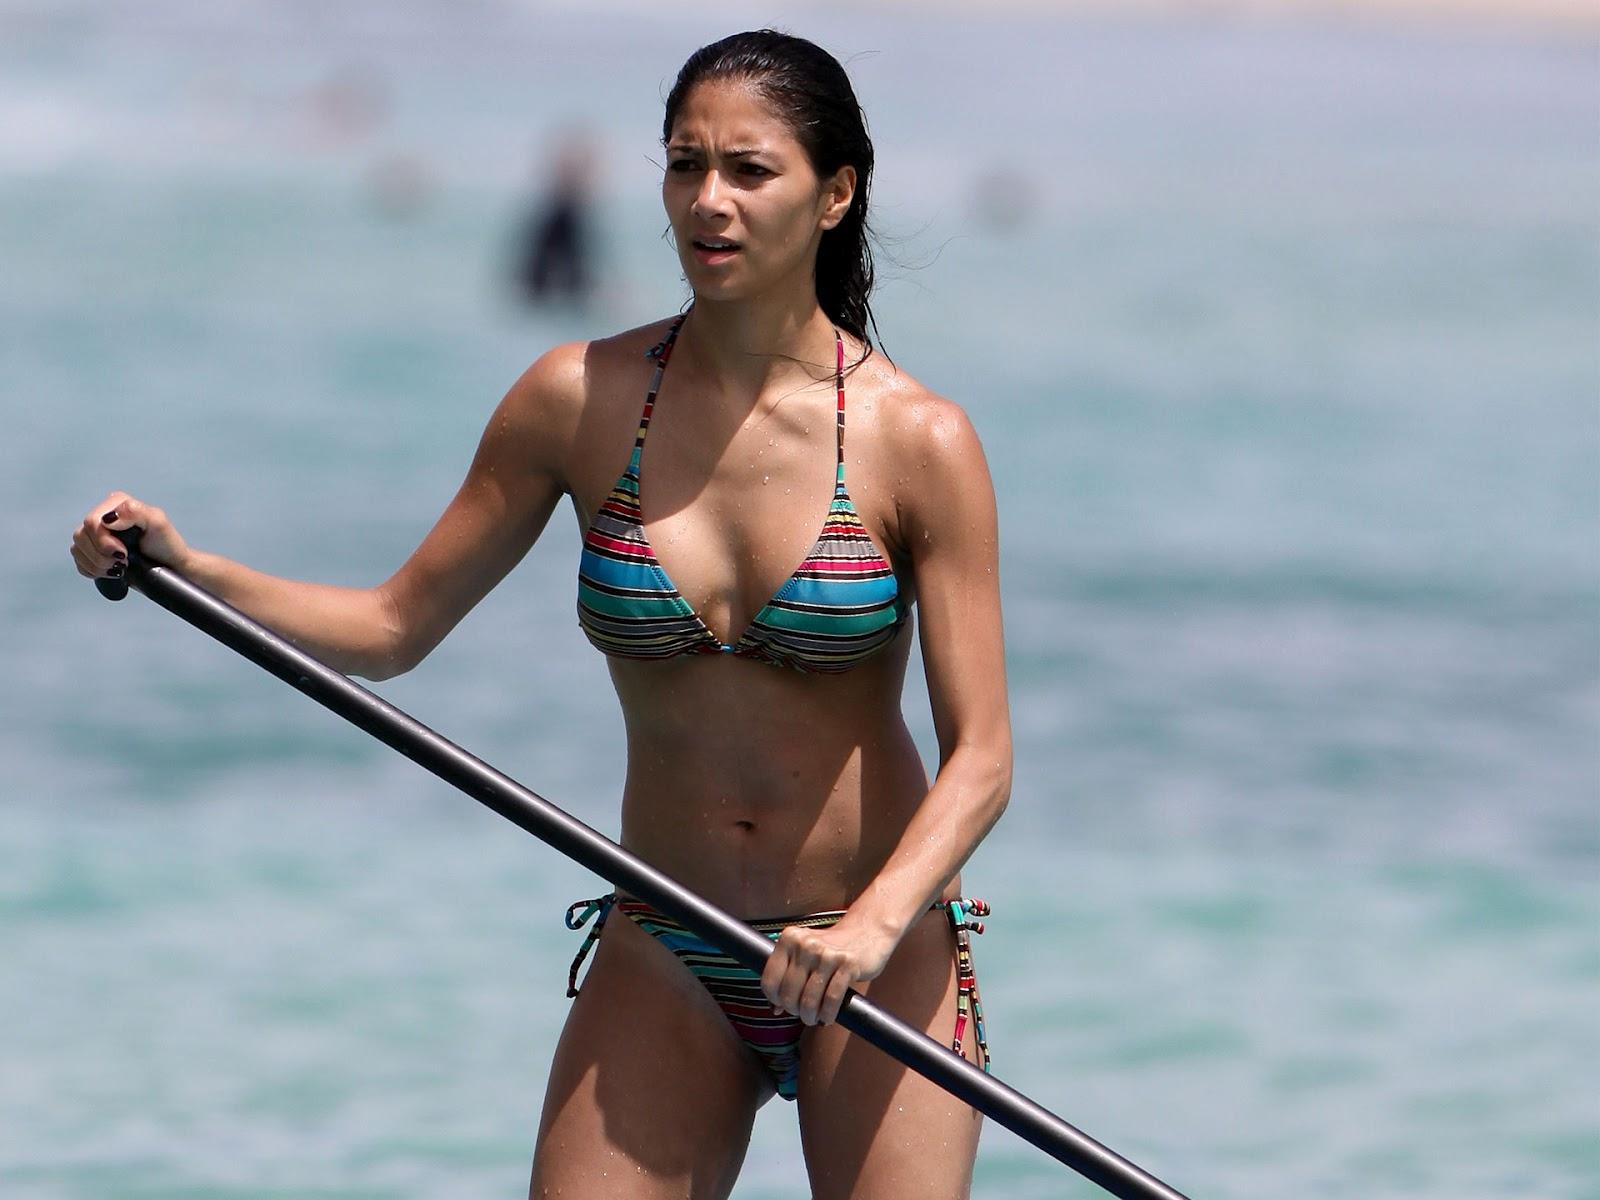 Nicole Scherzinger Sexy Photos